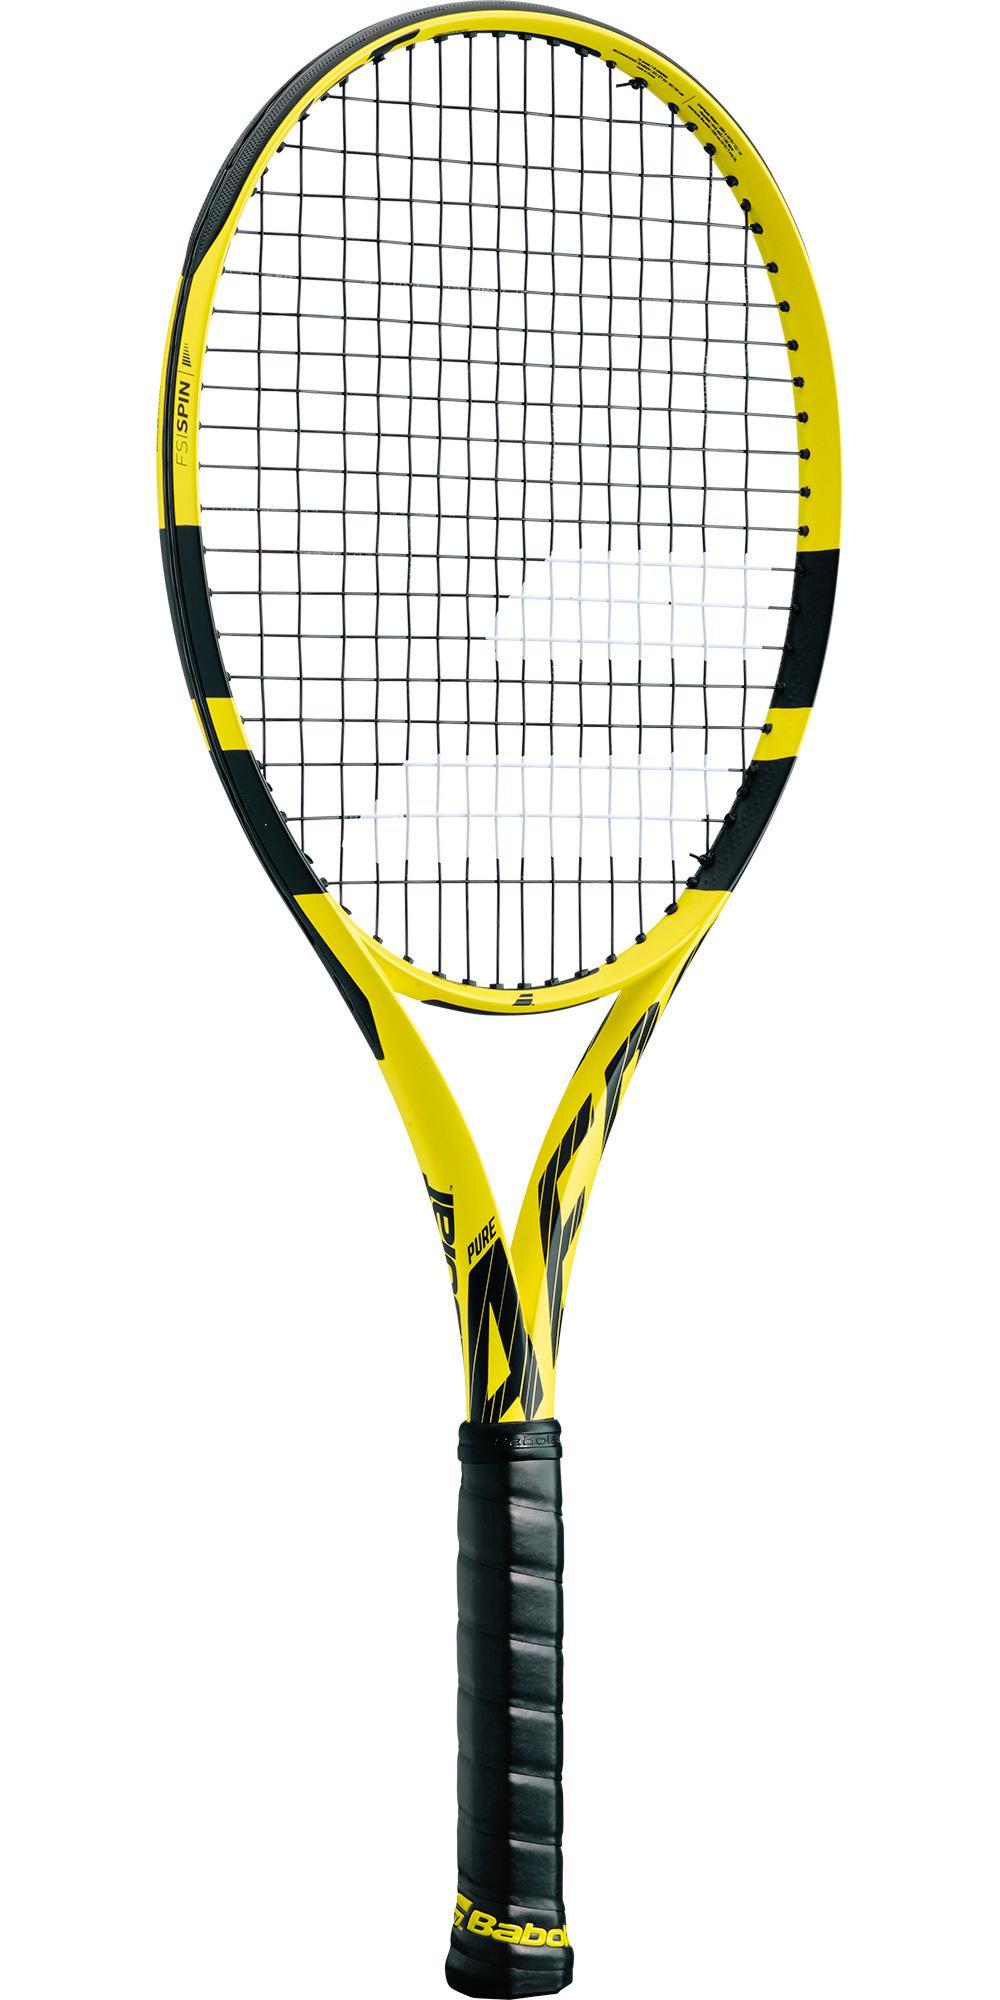 676693c1f8b2d Babolat Pure Aero Team Tennis Racket (2019) - Tennisnuts.com